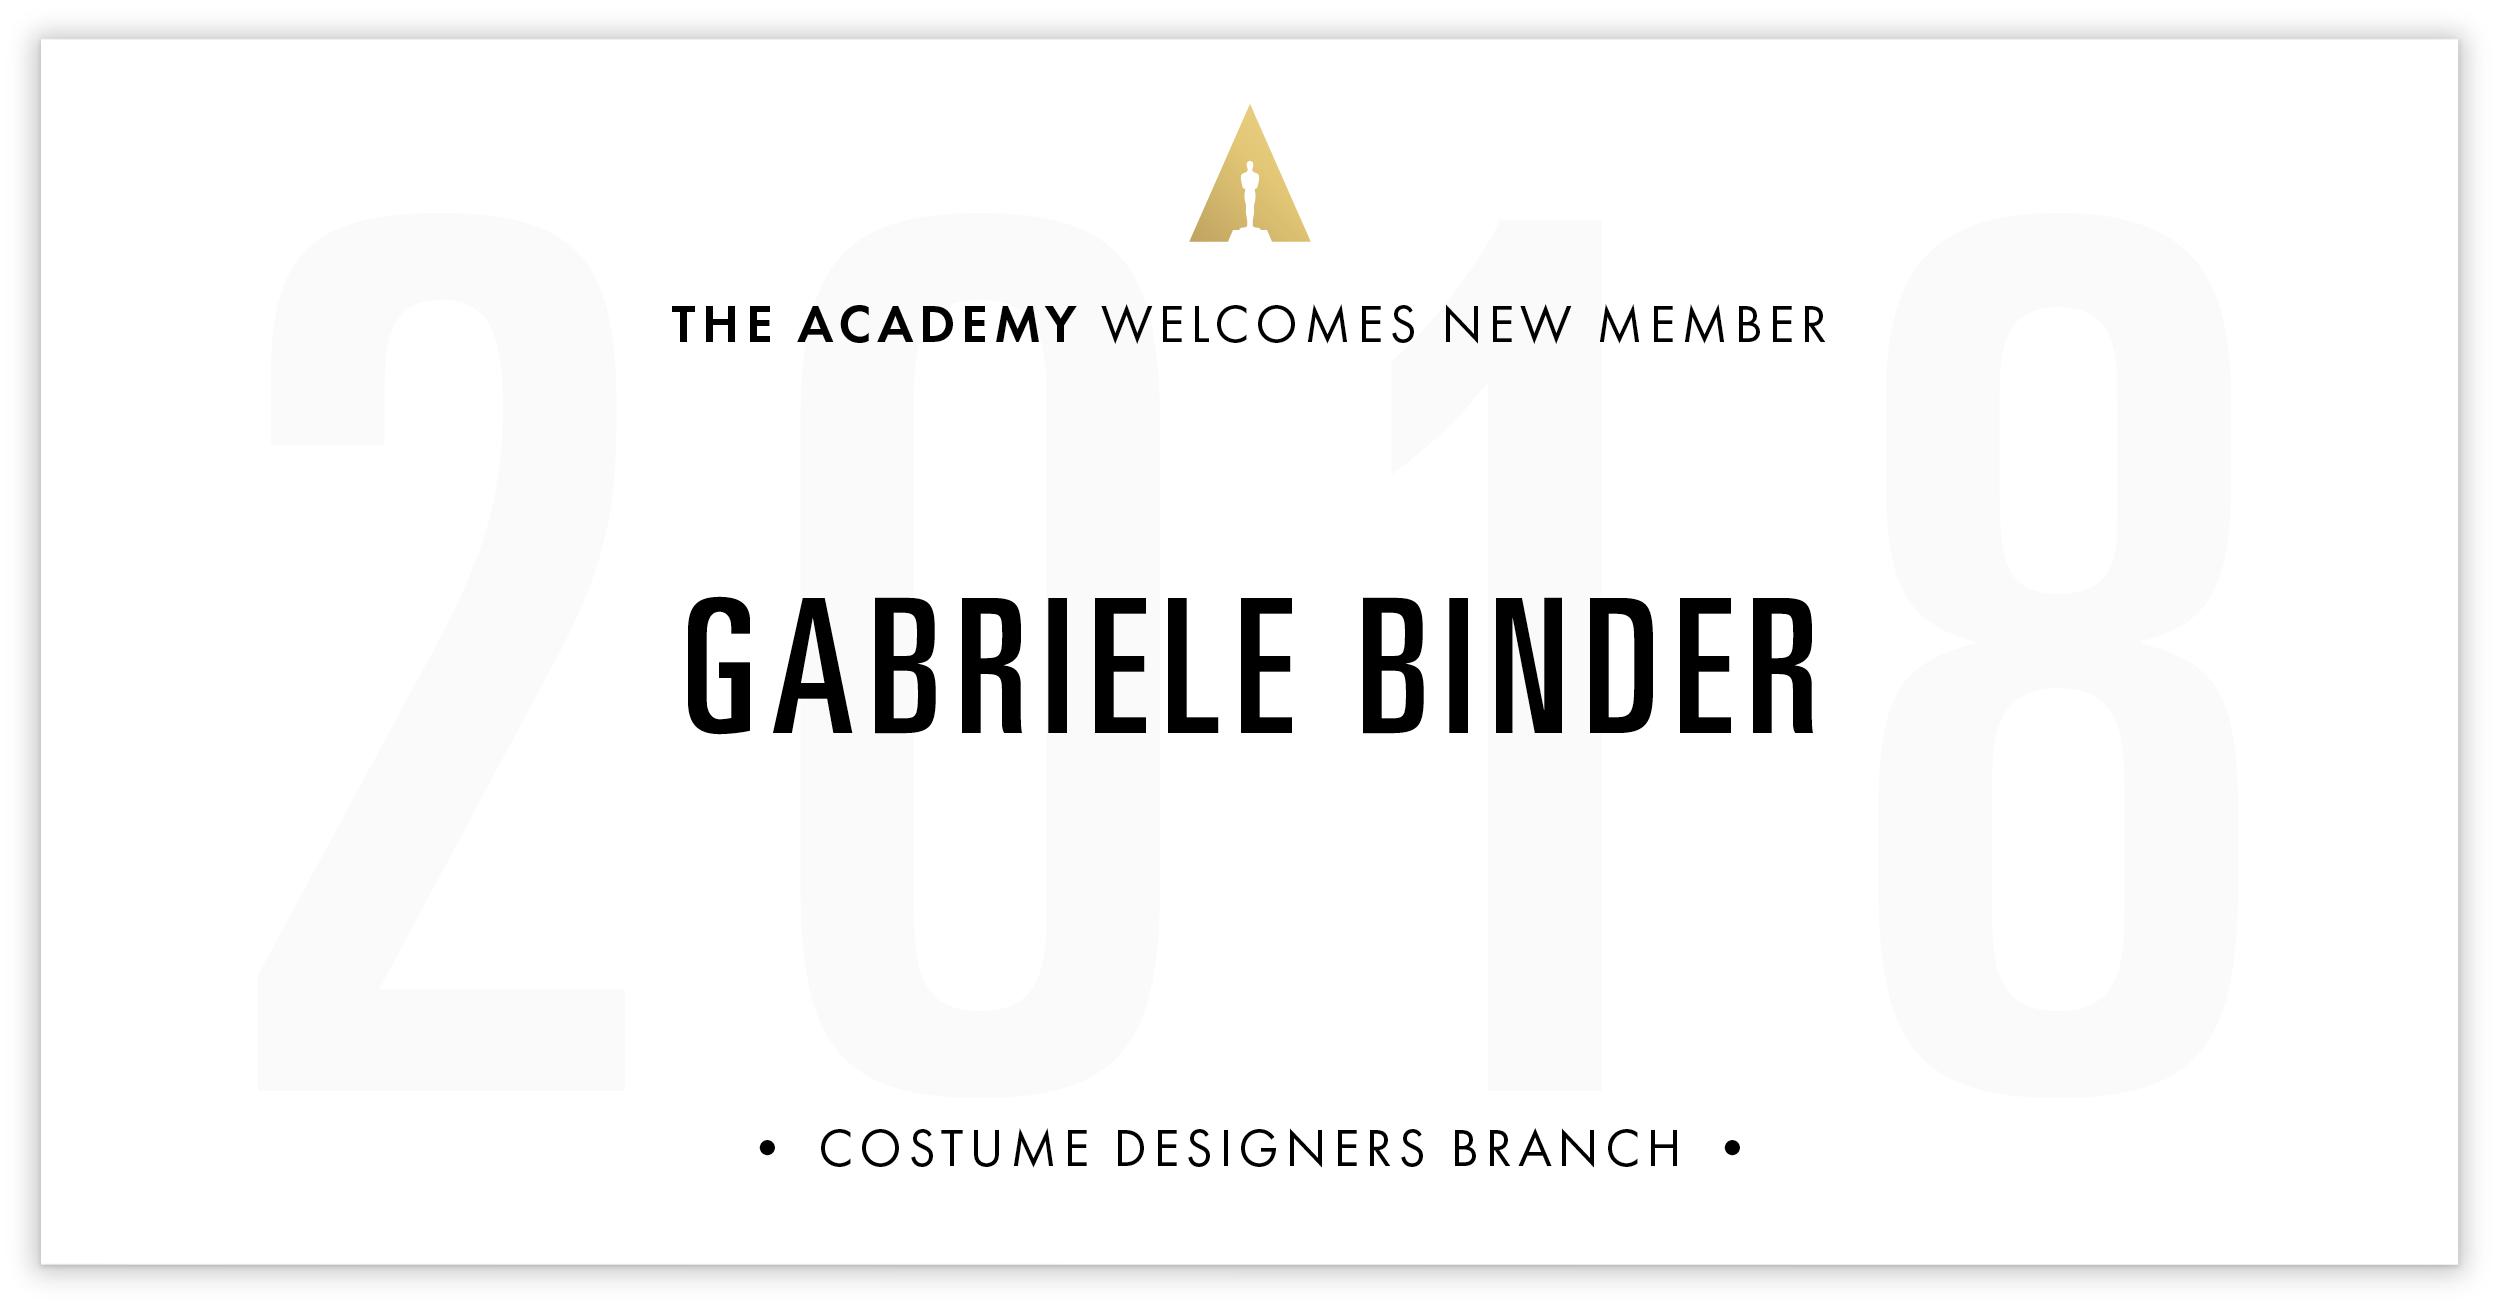 Gabriele Binder is invited!